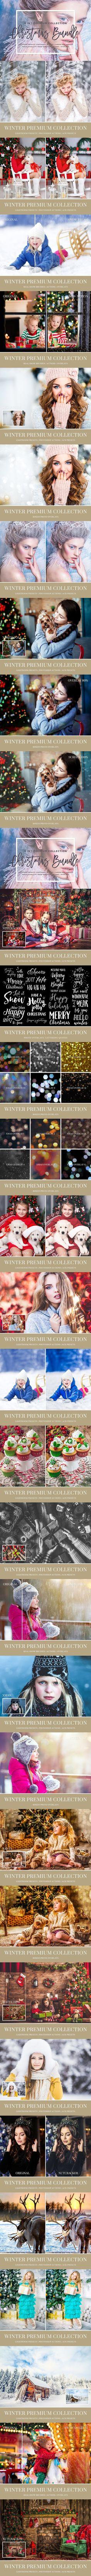 Winter Lightroom & Photoshop Bundle. Actions. $29.00